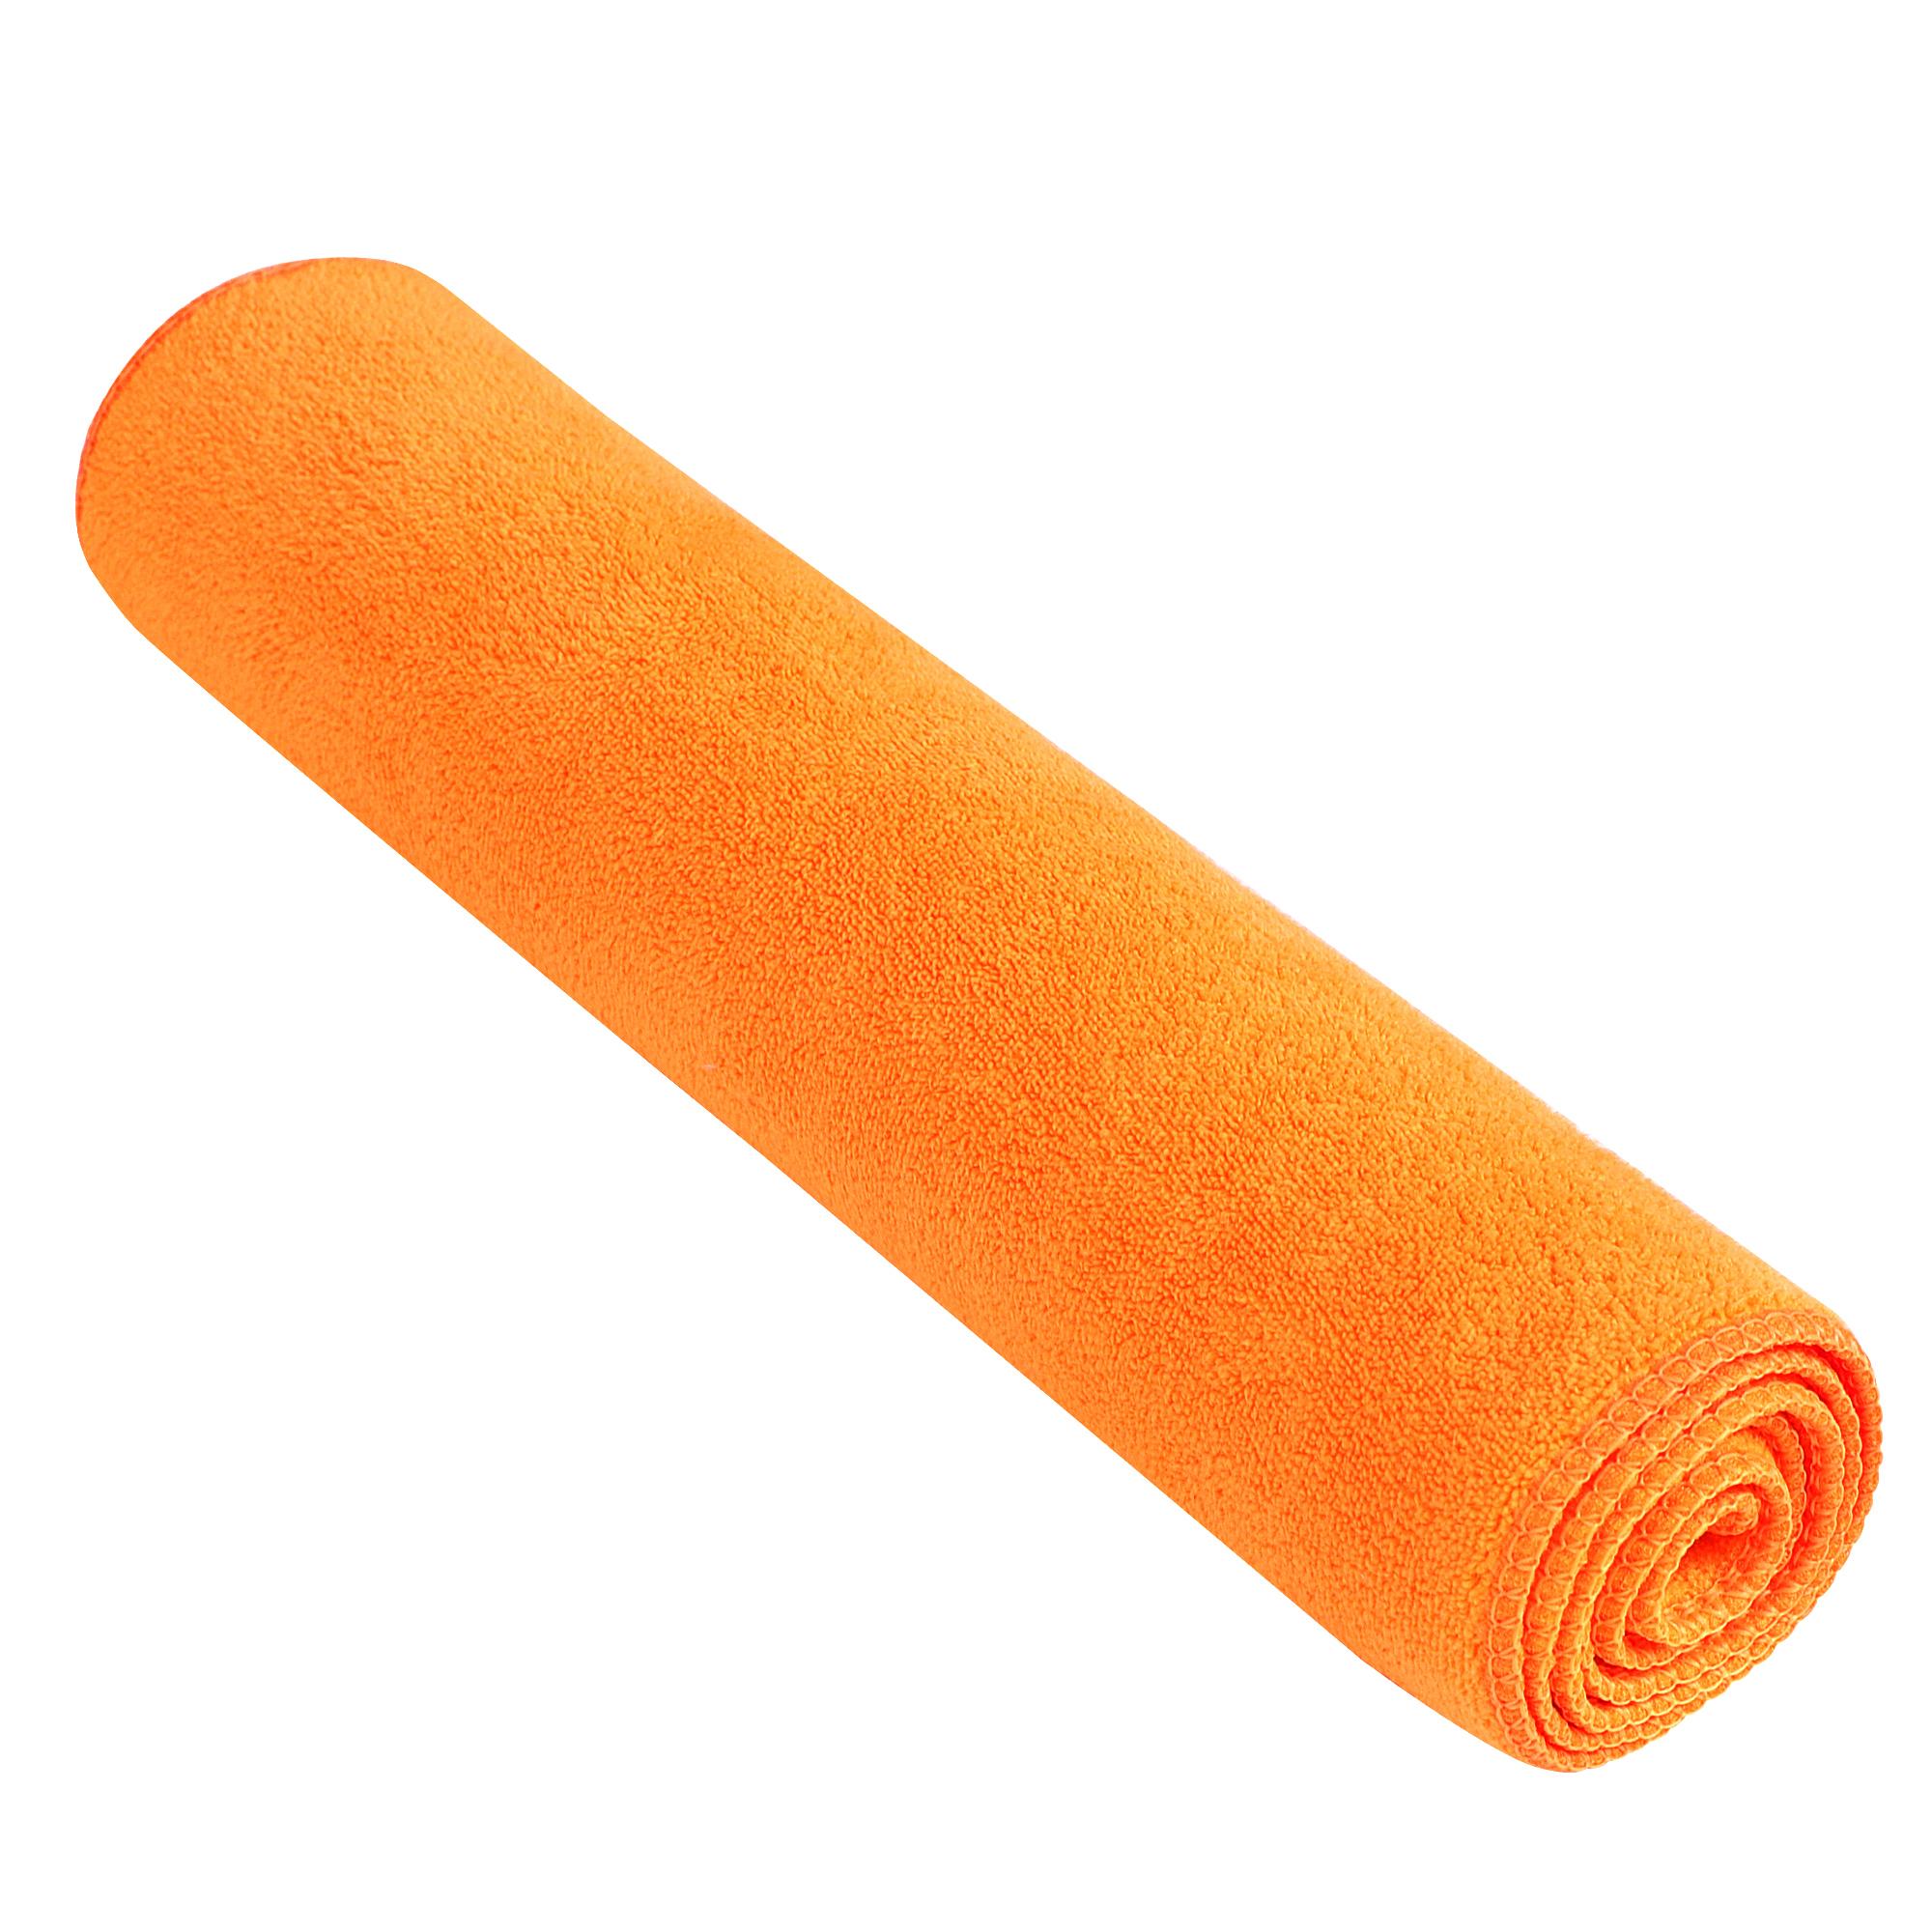 "28"" x 12"" Orange Microfiber Hair Wash Clean Drying Bath Shower Beach Towel Washcloths Cleaning Cloths"